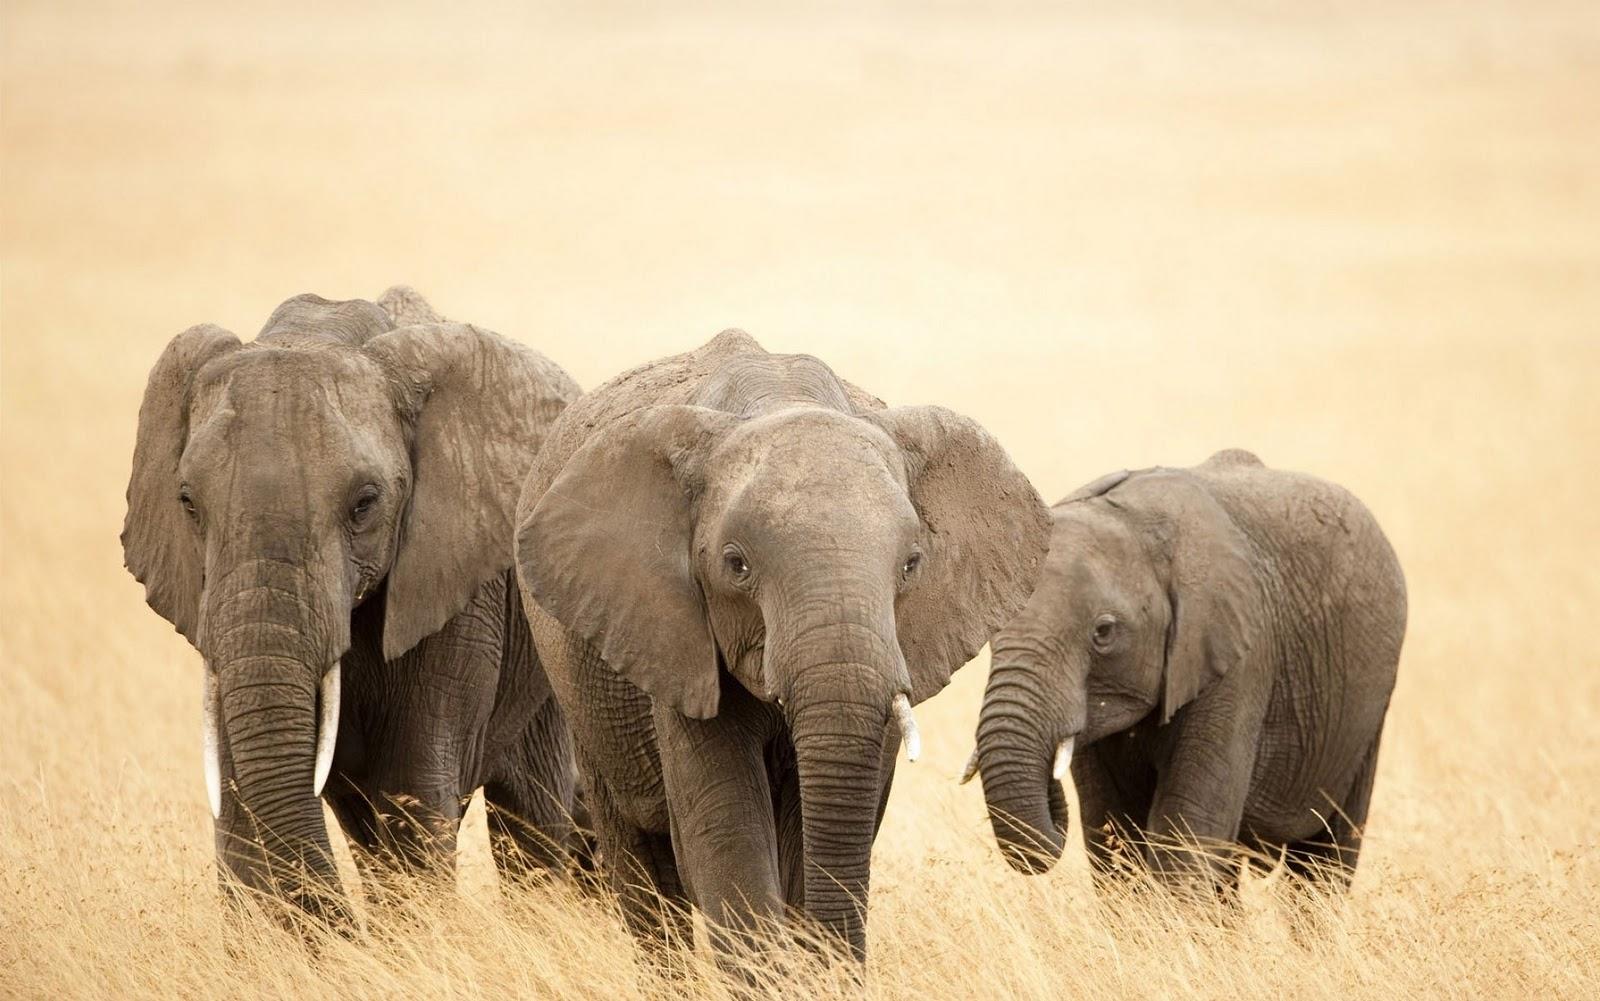 elephants wallpapers world - photo #2